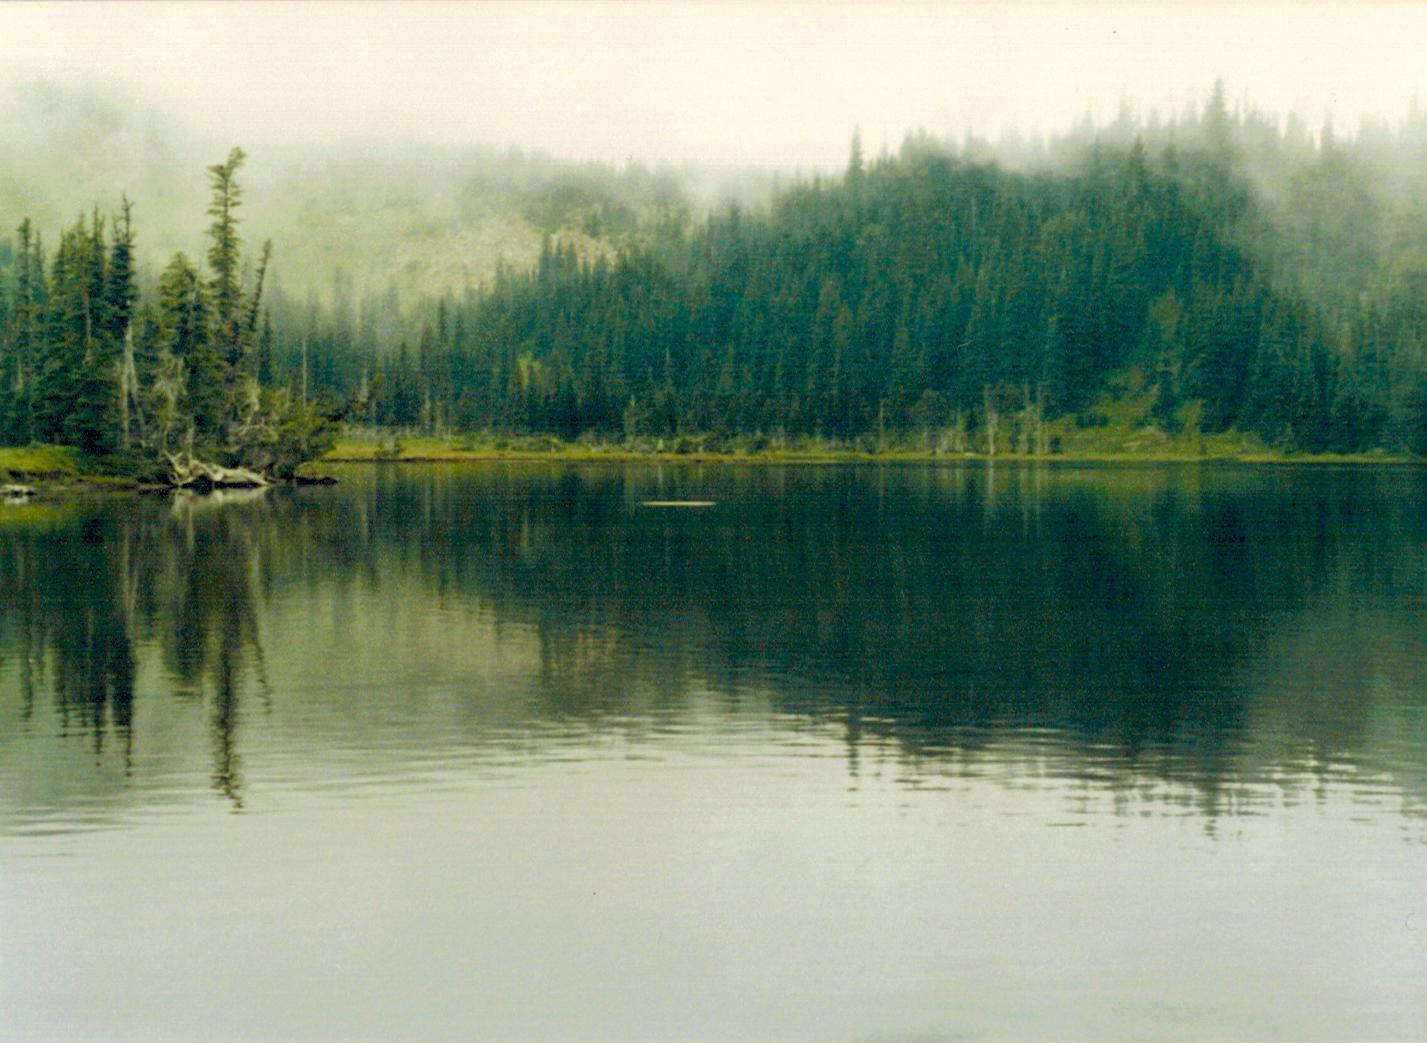 Mystic Lake, August 1987